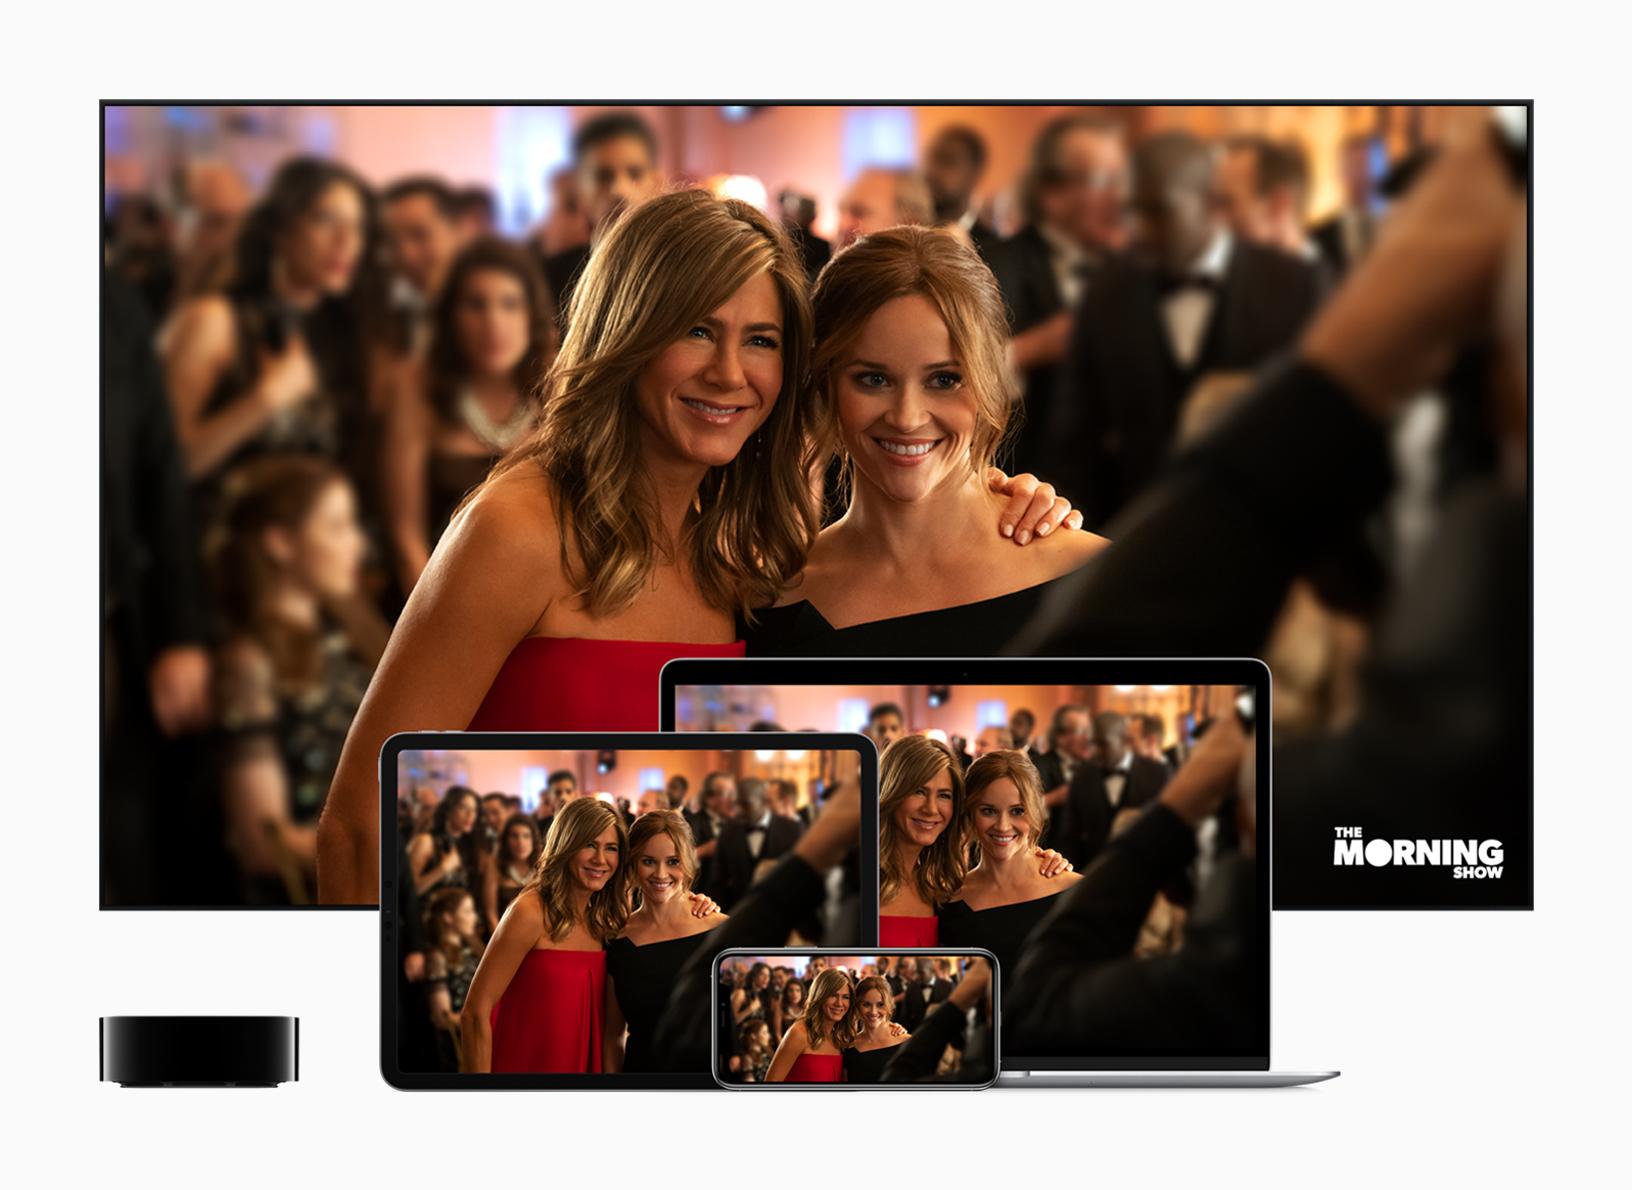 [PROMO INSIDE] Apple TV+ - Apple's very own video streaming platform featuring original shows - Alvinology